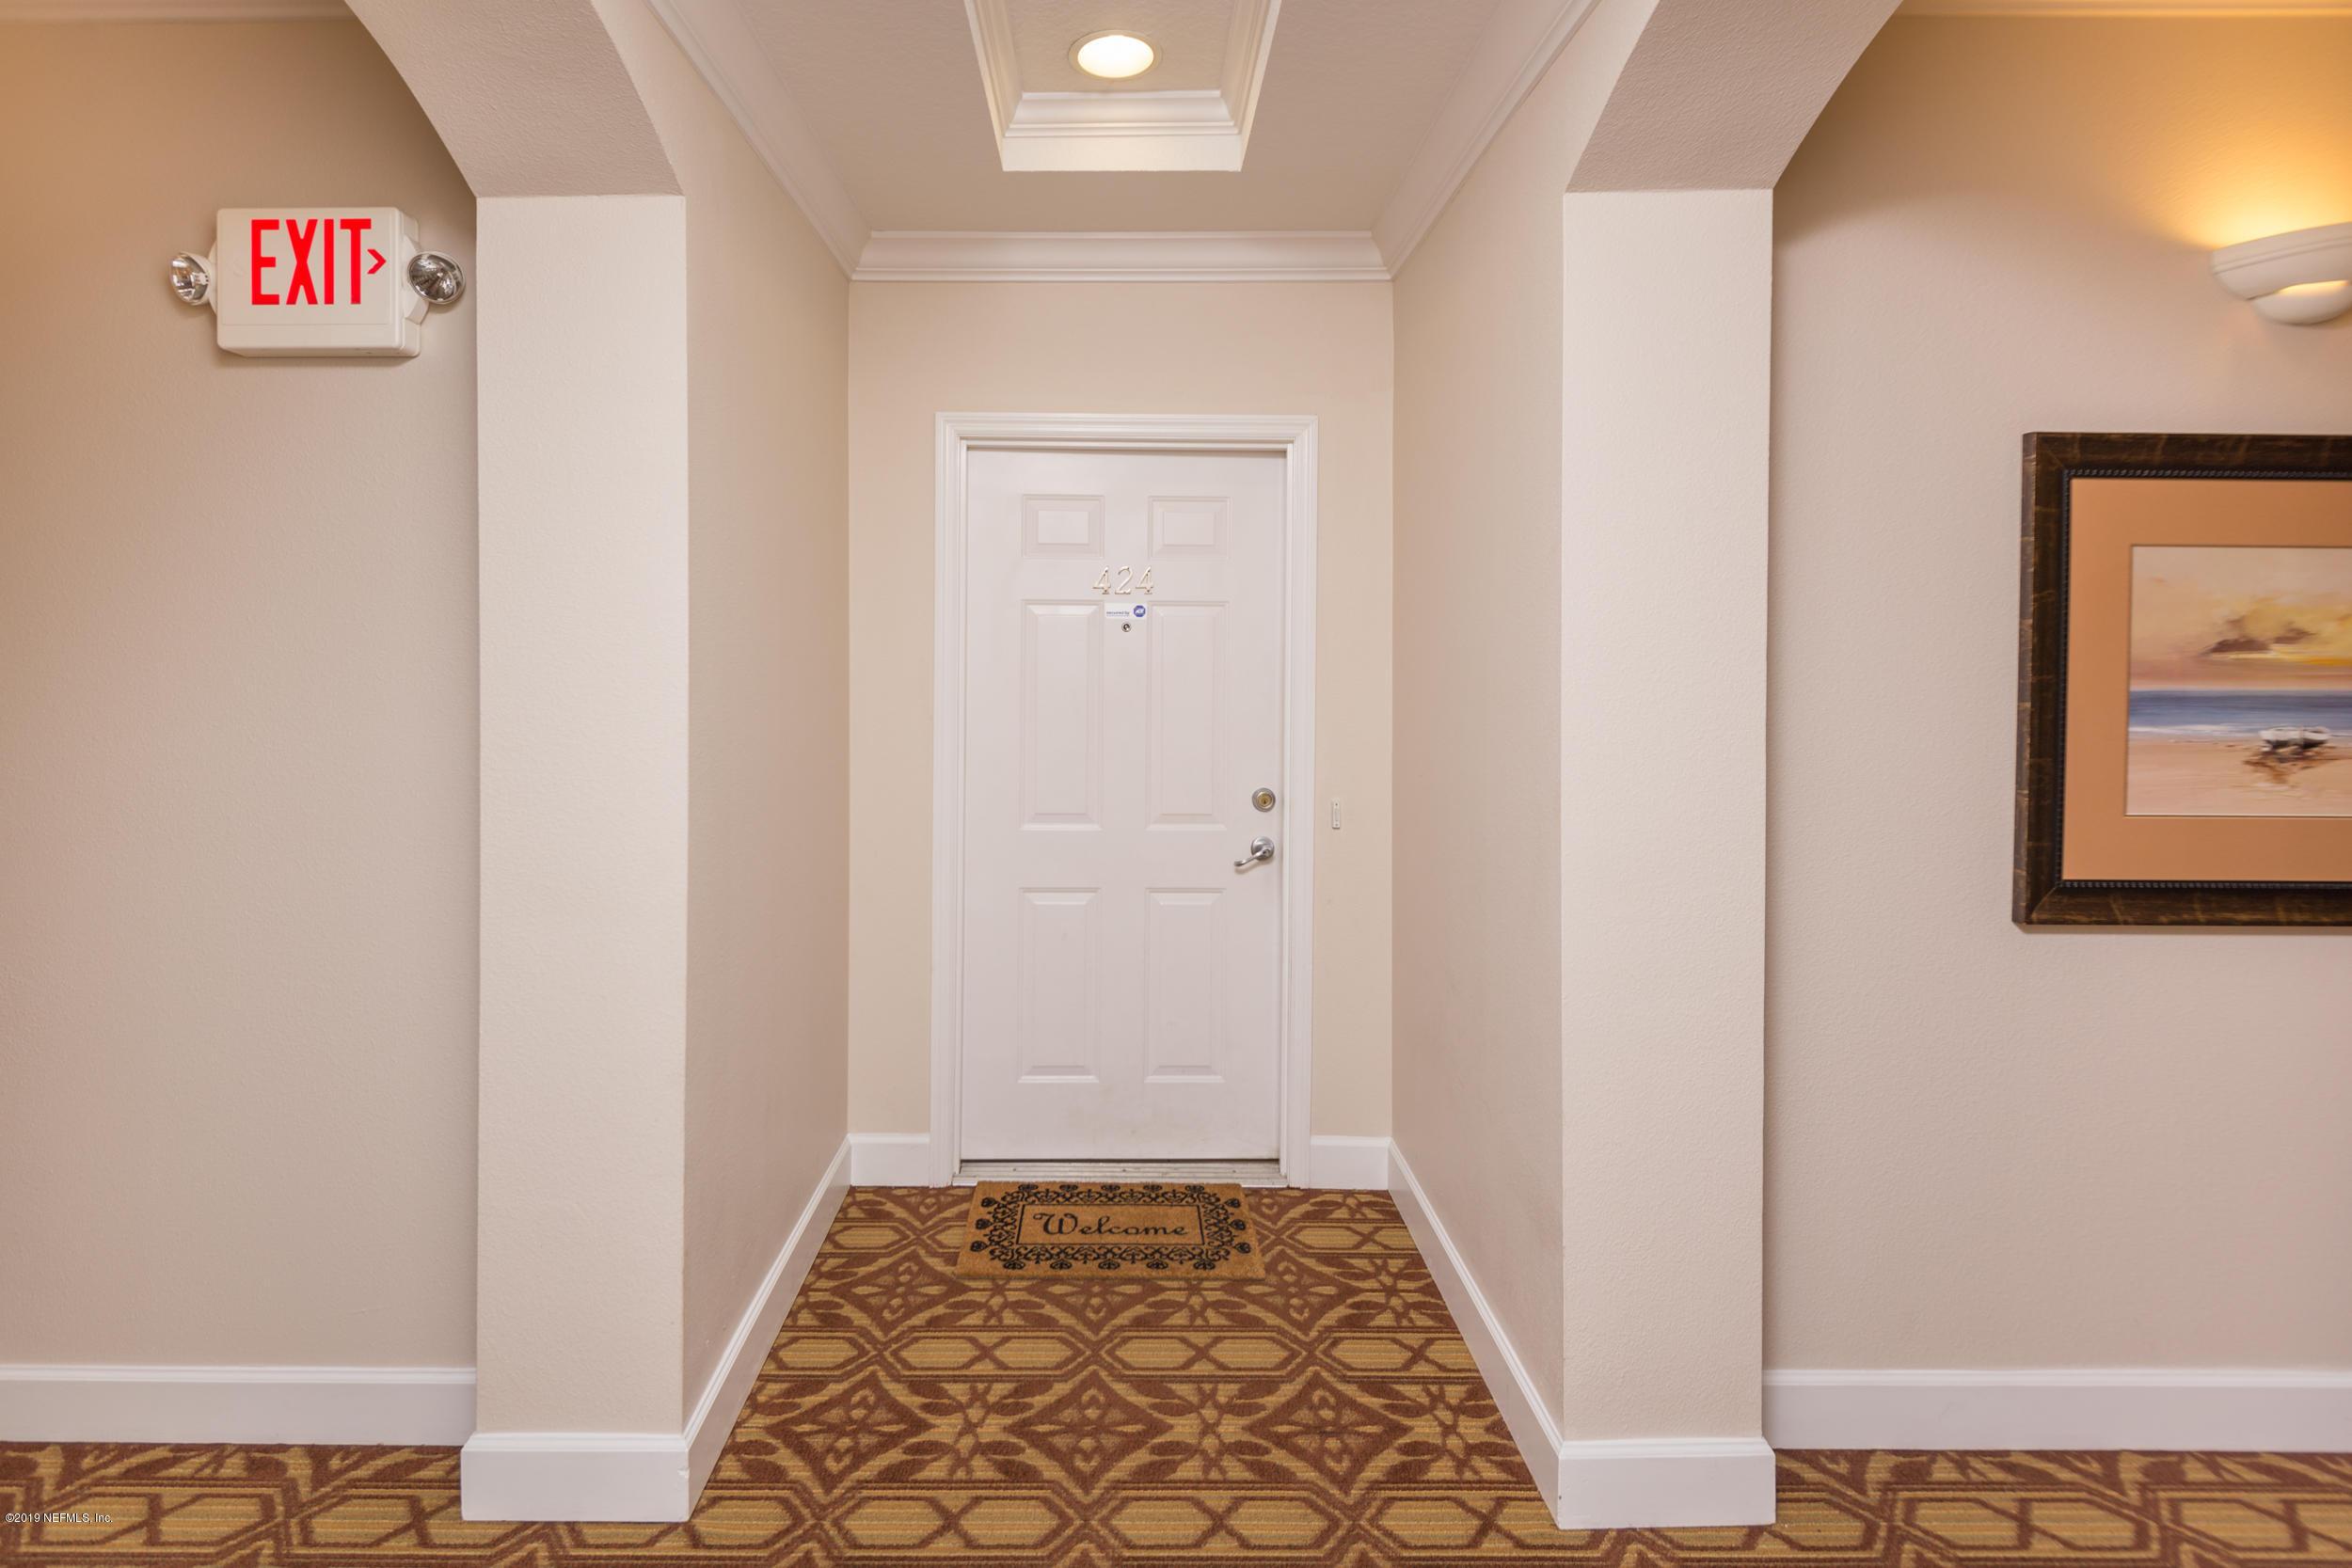 4480 DEERWOOD LAKE- JACKSONVILLE- FLORIDA 32216, 2 Bedrooms Bedrooms, ,2 BathroomsBathrooms,Condo,For sale,DEERWOOD LAKE,1015385